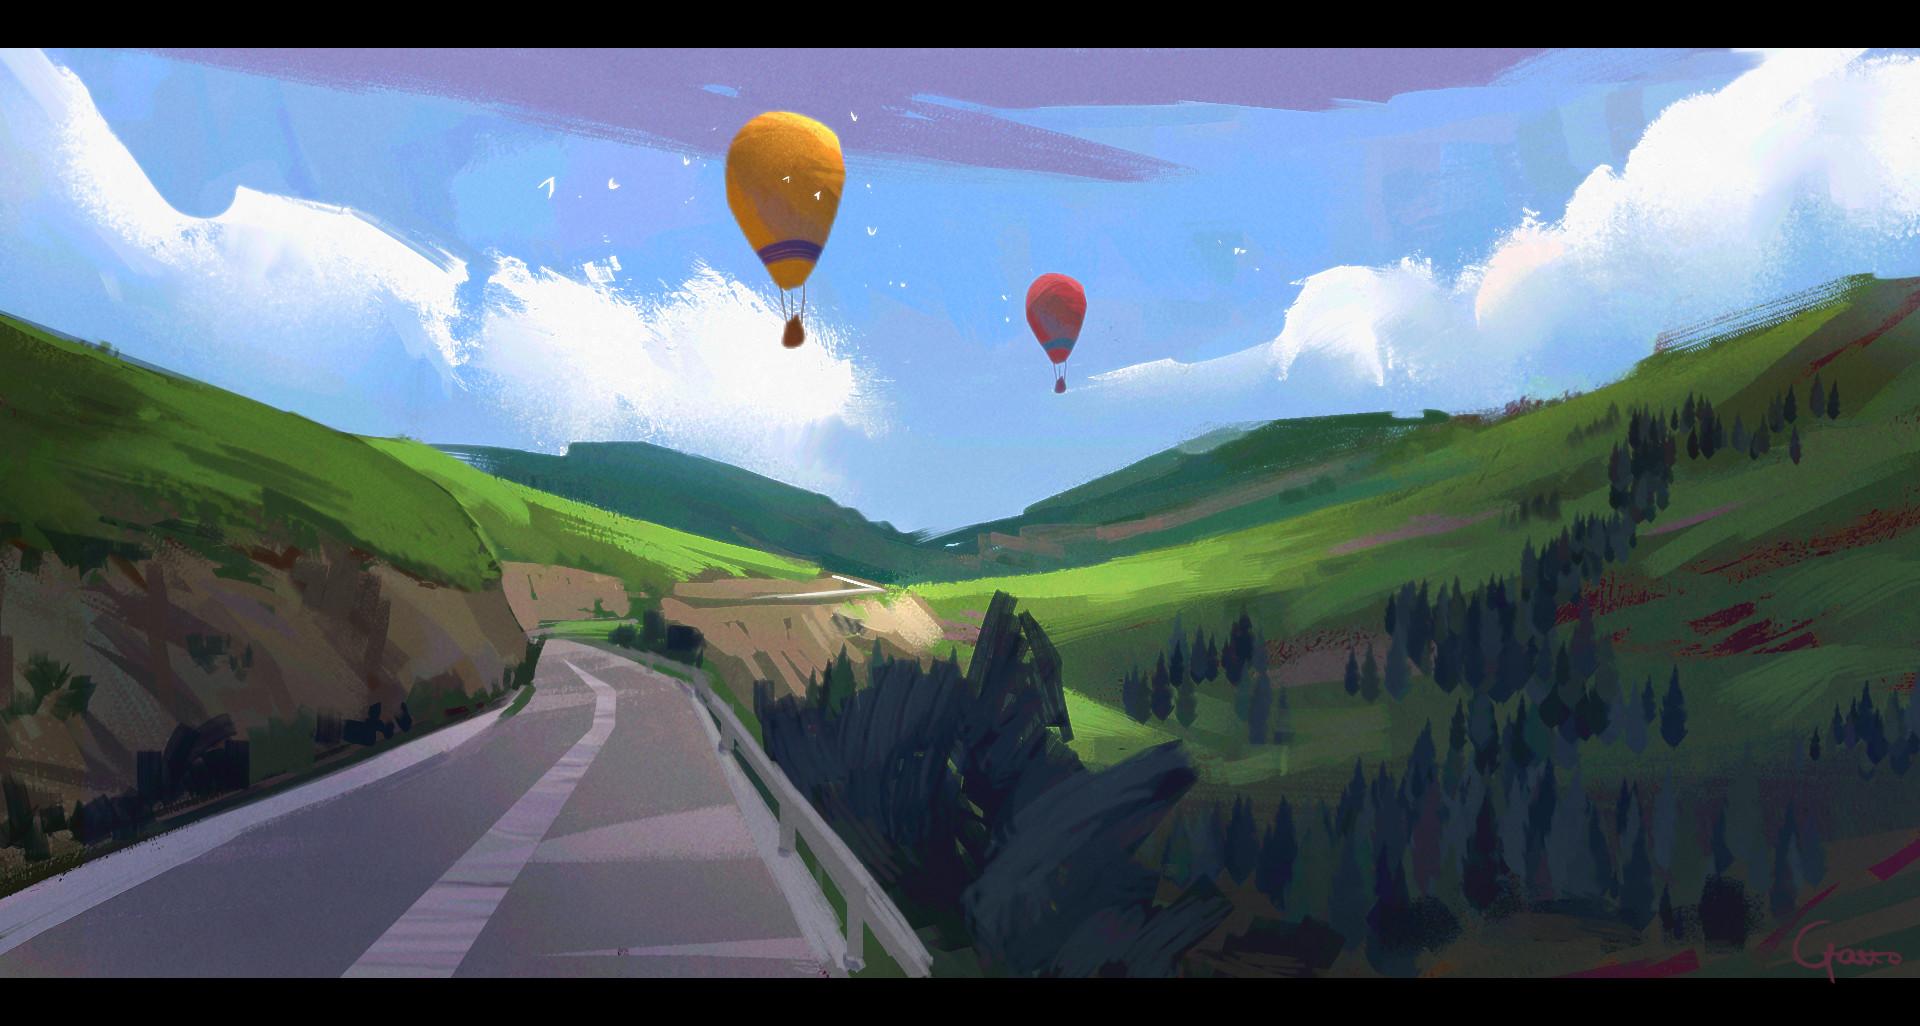 Roberto gatto airballoons